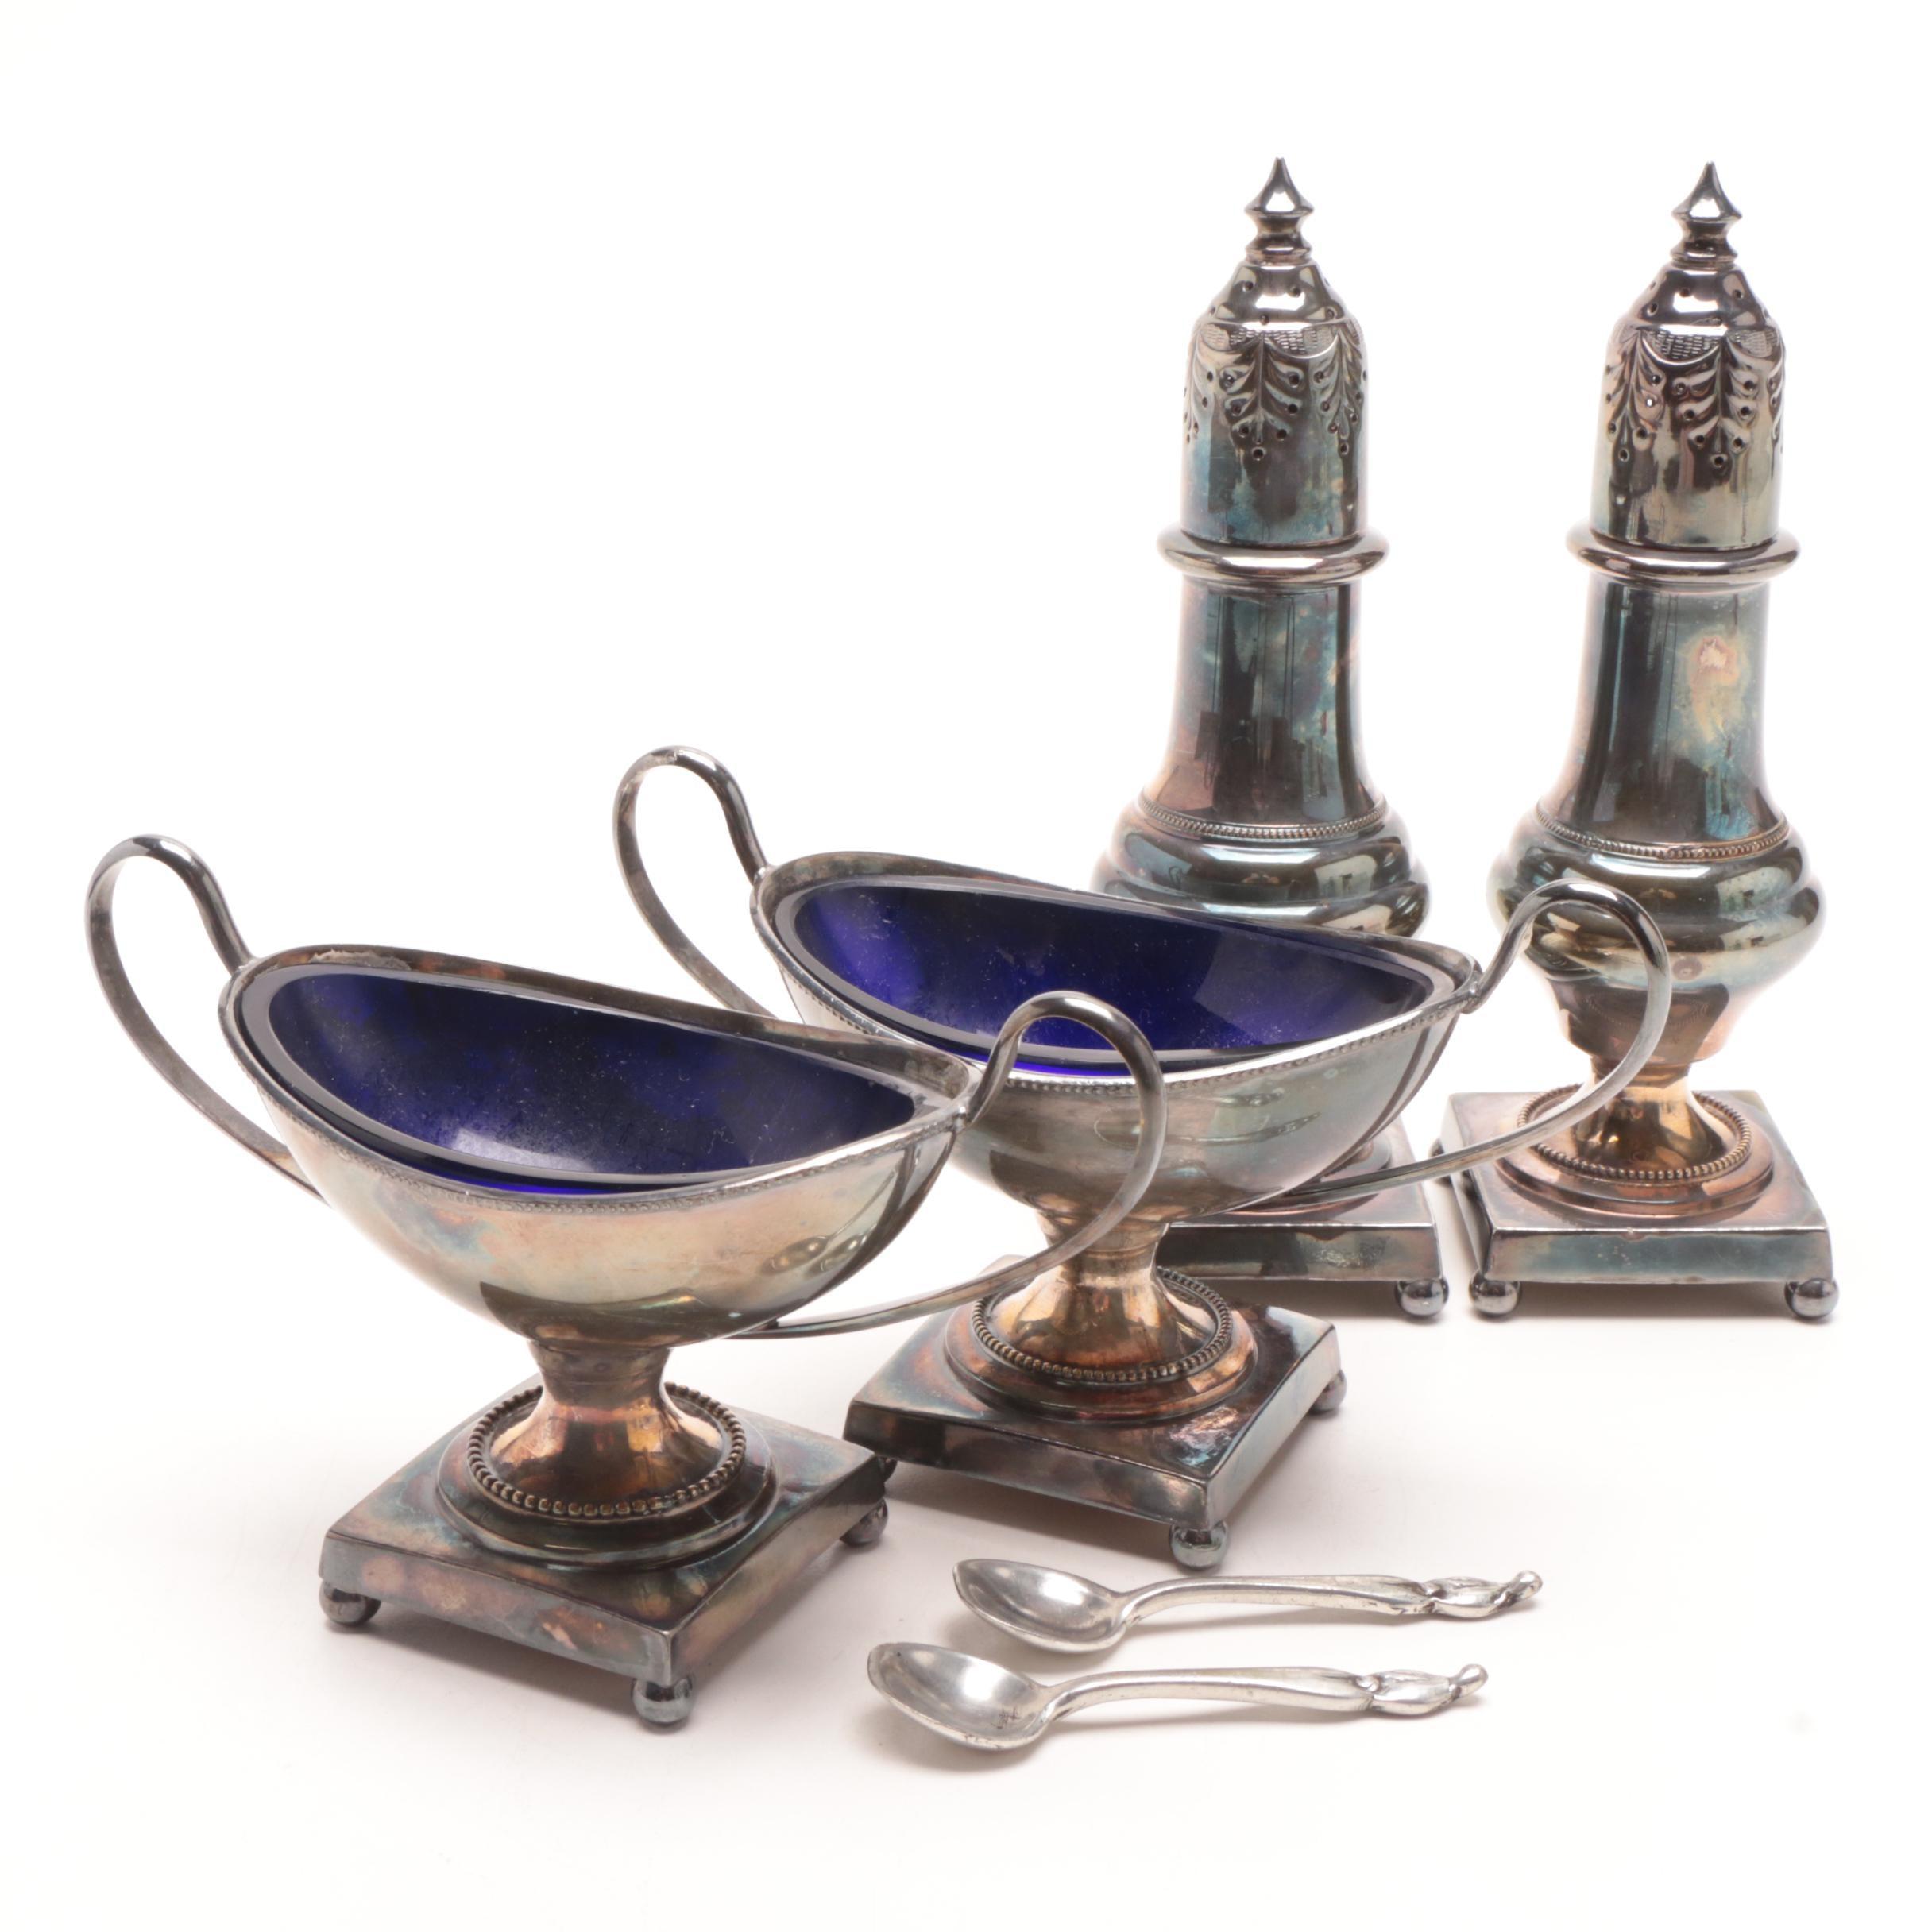 E. G. Webster & Son Silverplate Tableware